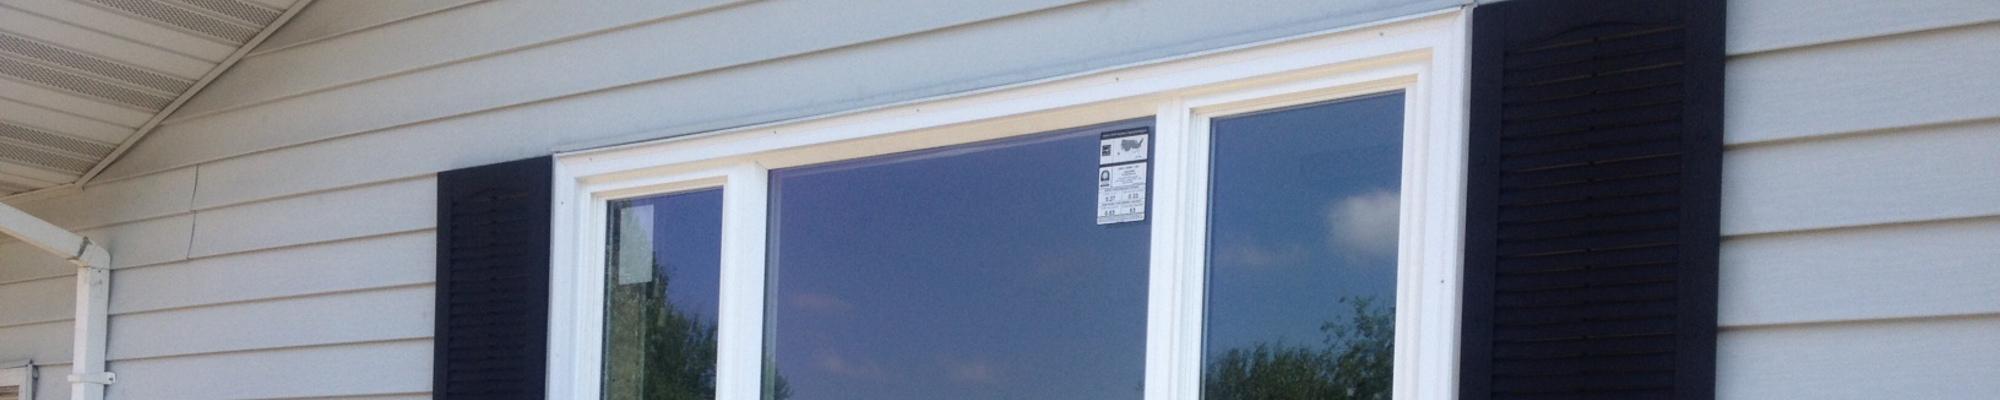 Appleton Replacement Windows Amp Doors Vinyl Windows